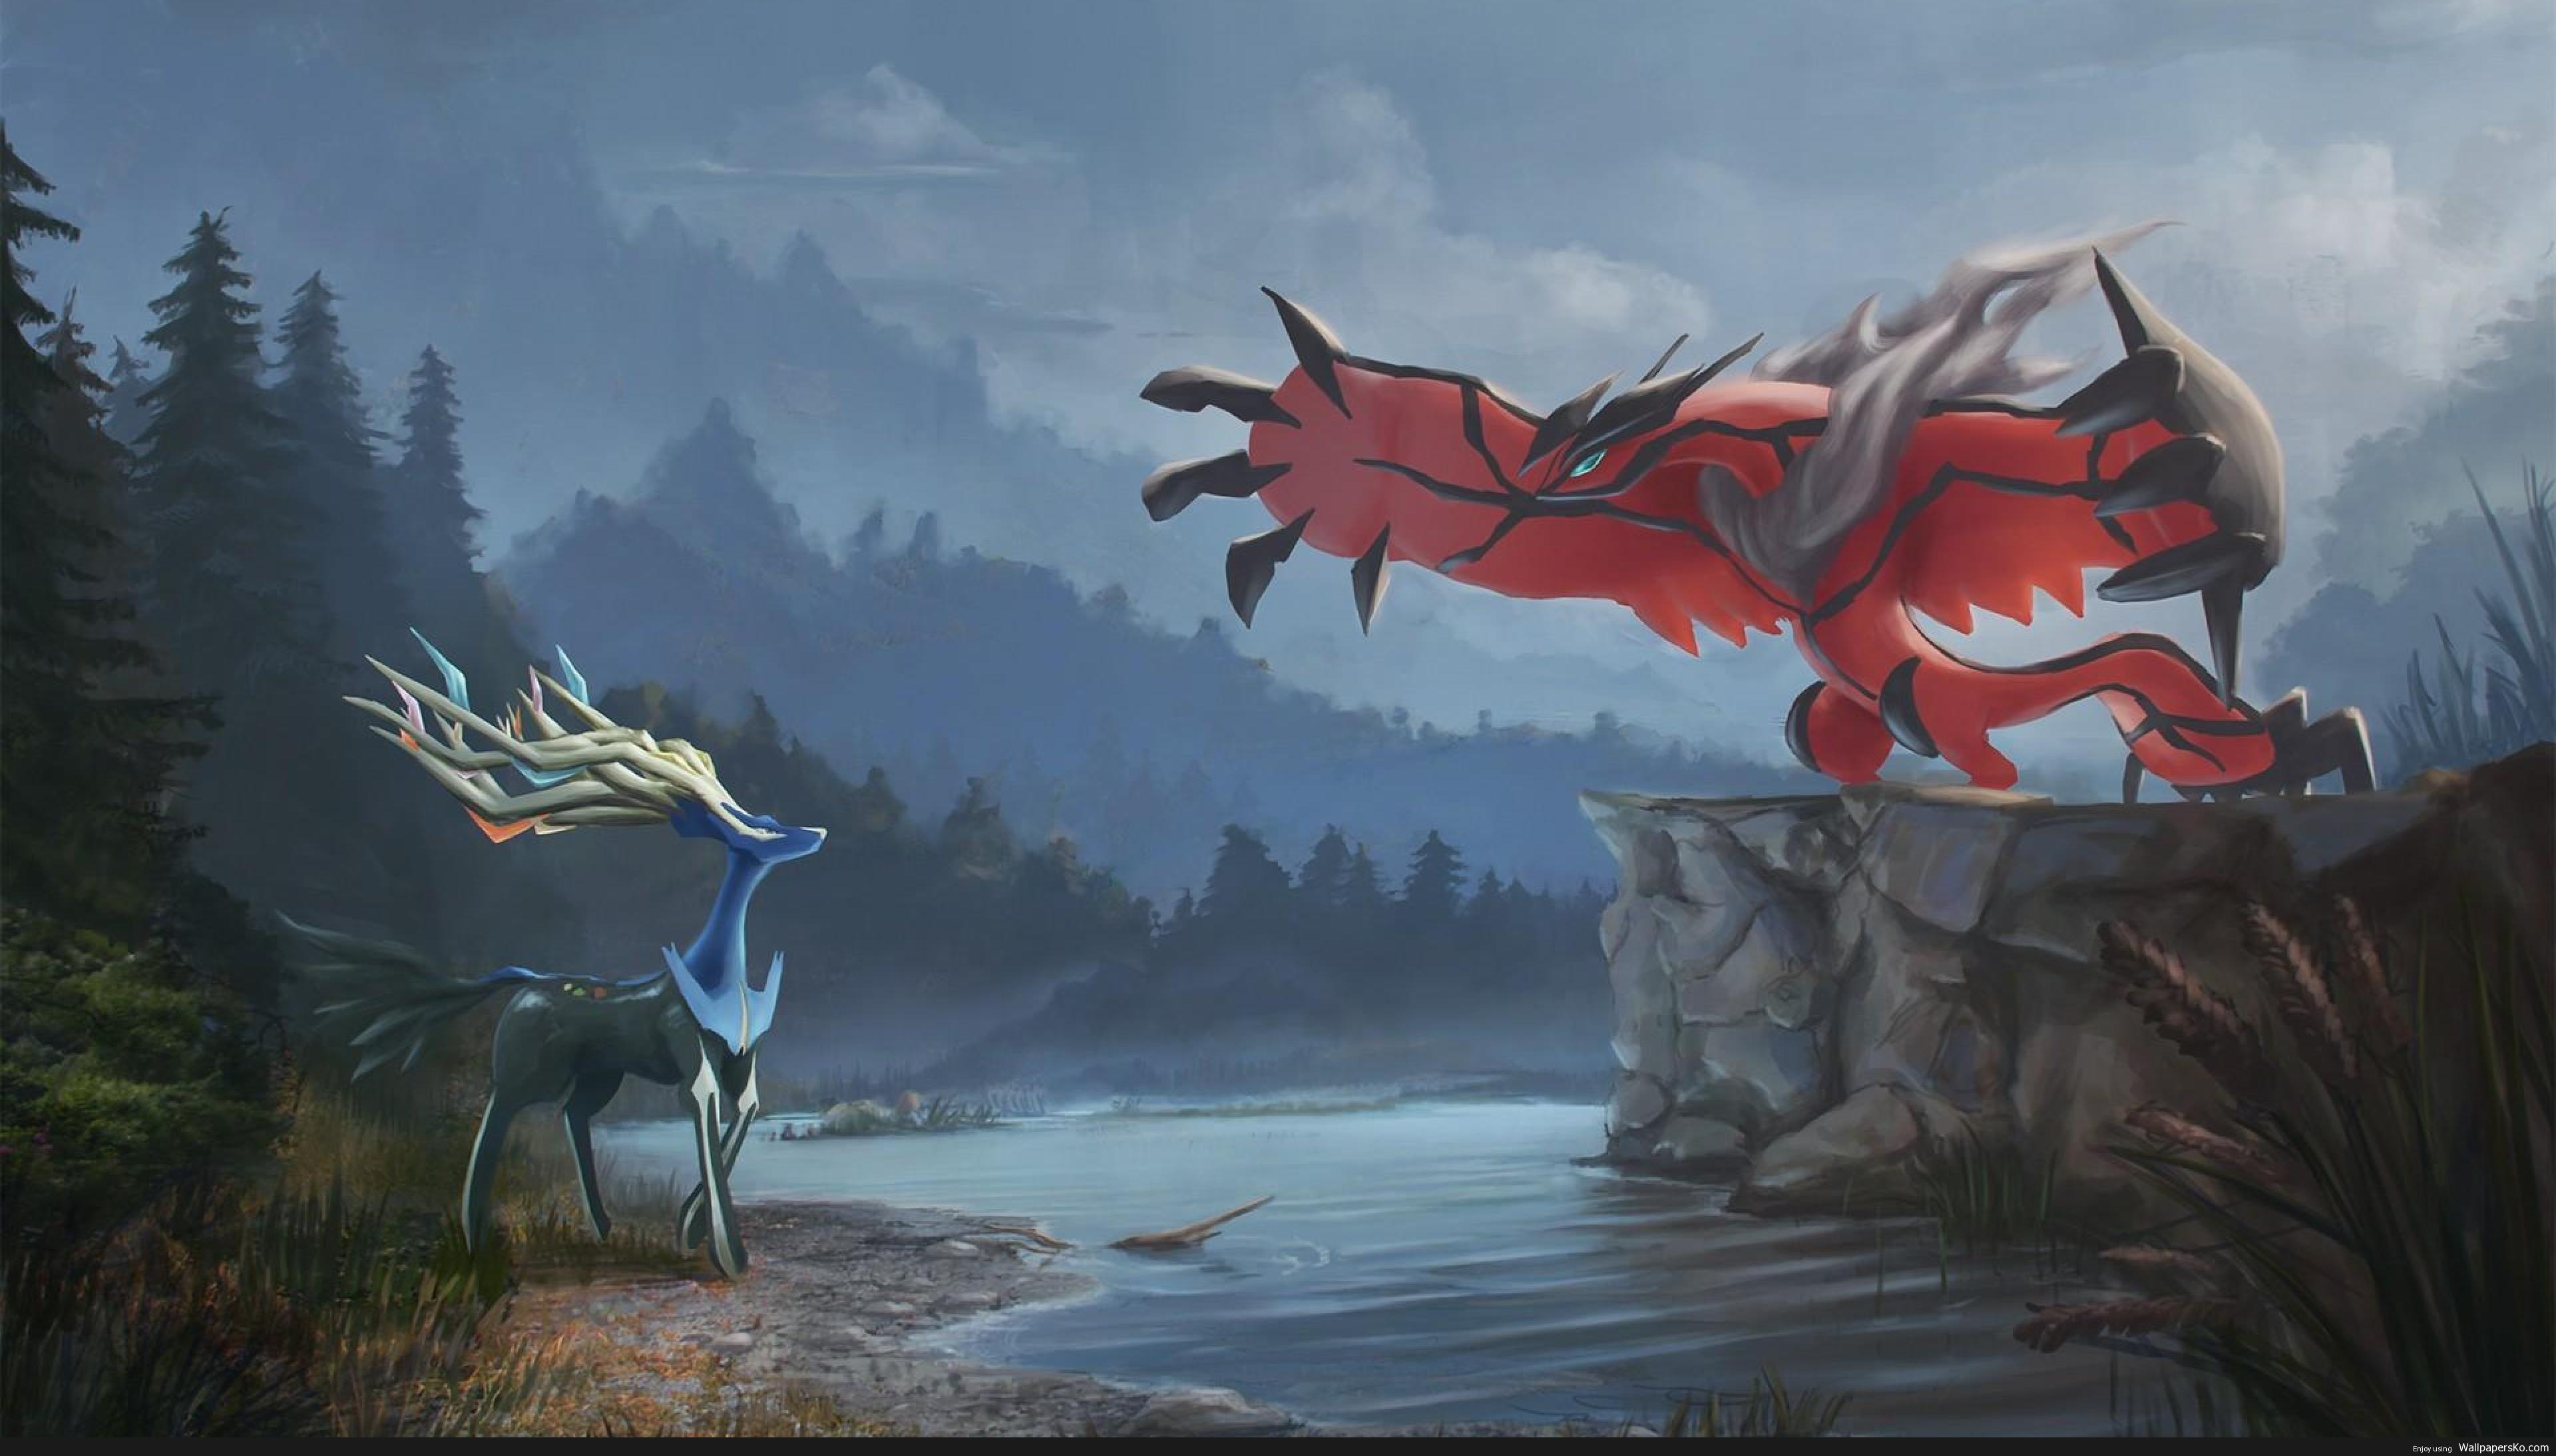 pokemon wallpaper 4k